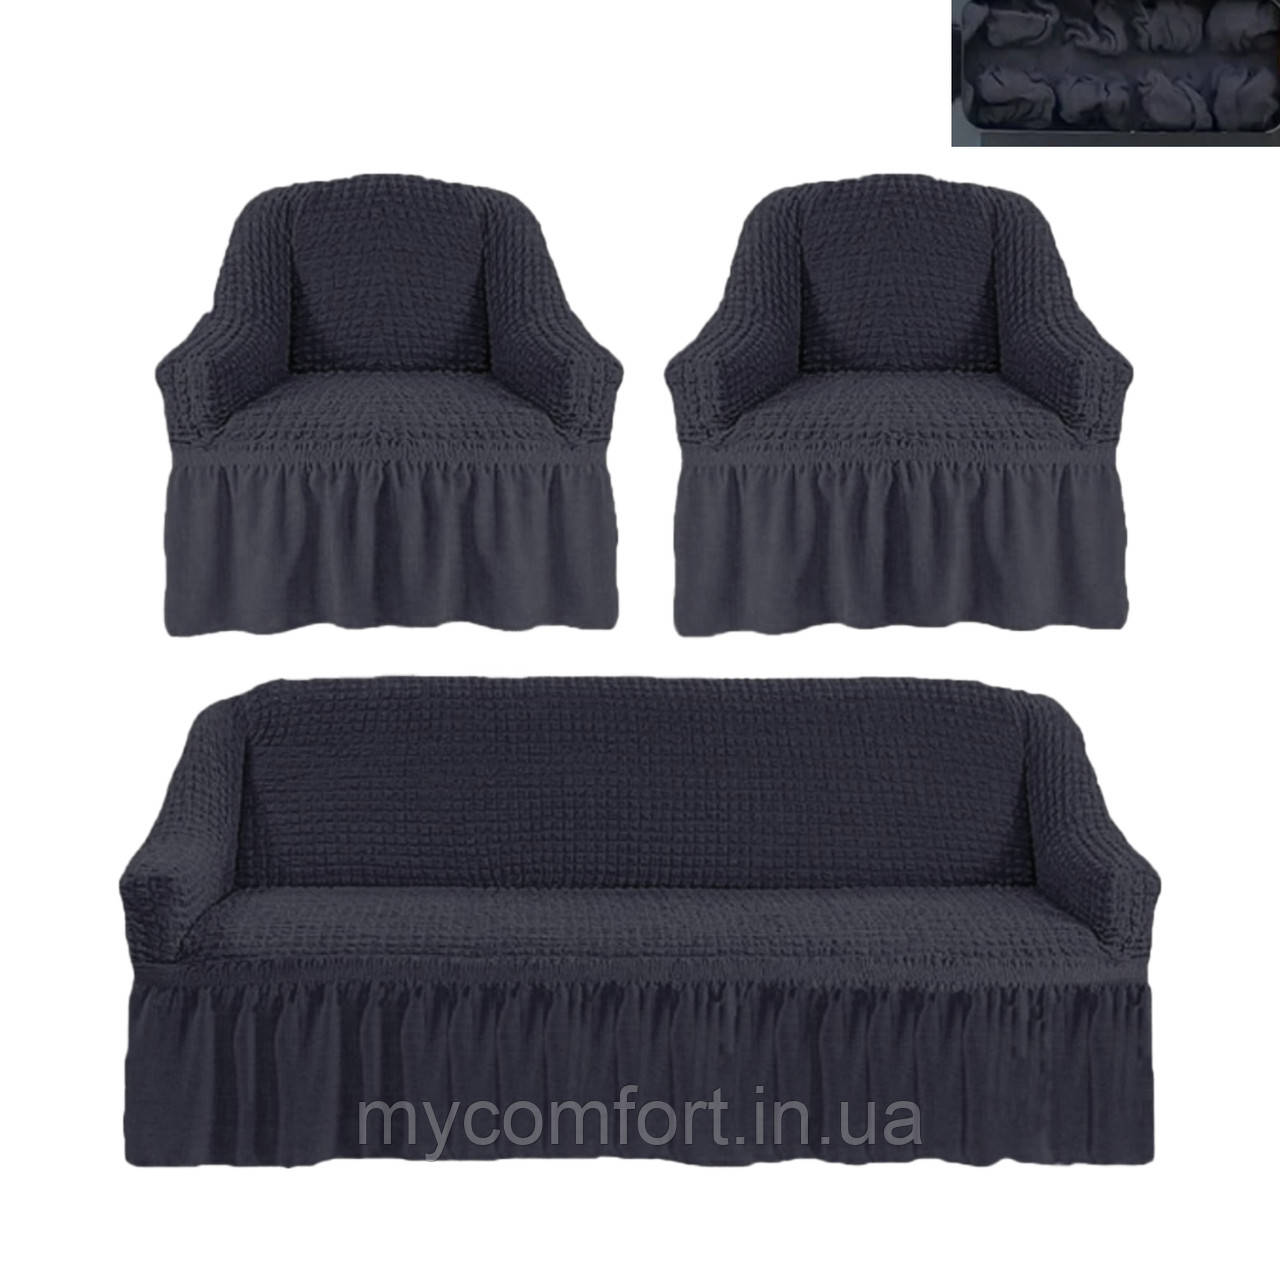 Чехол на диван и два кресла. Графит